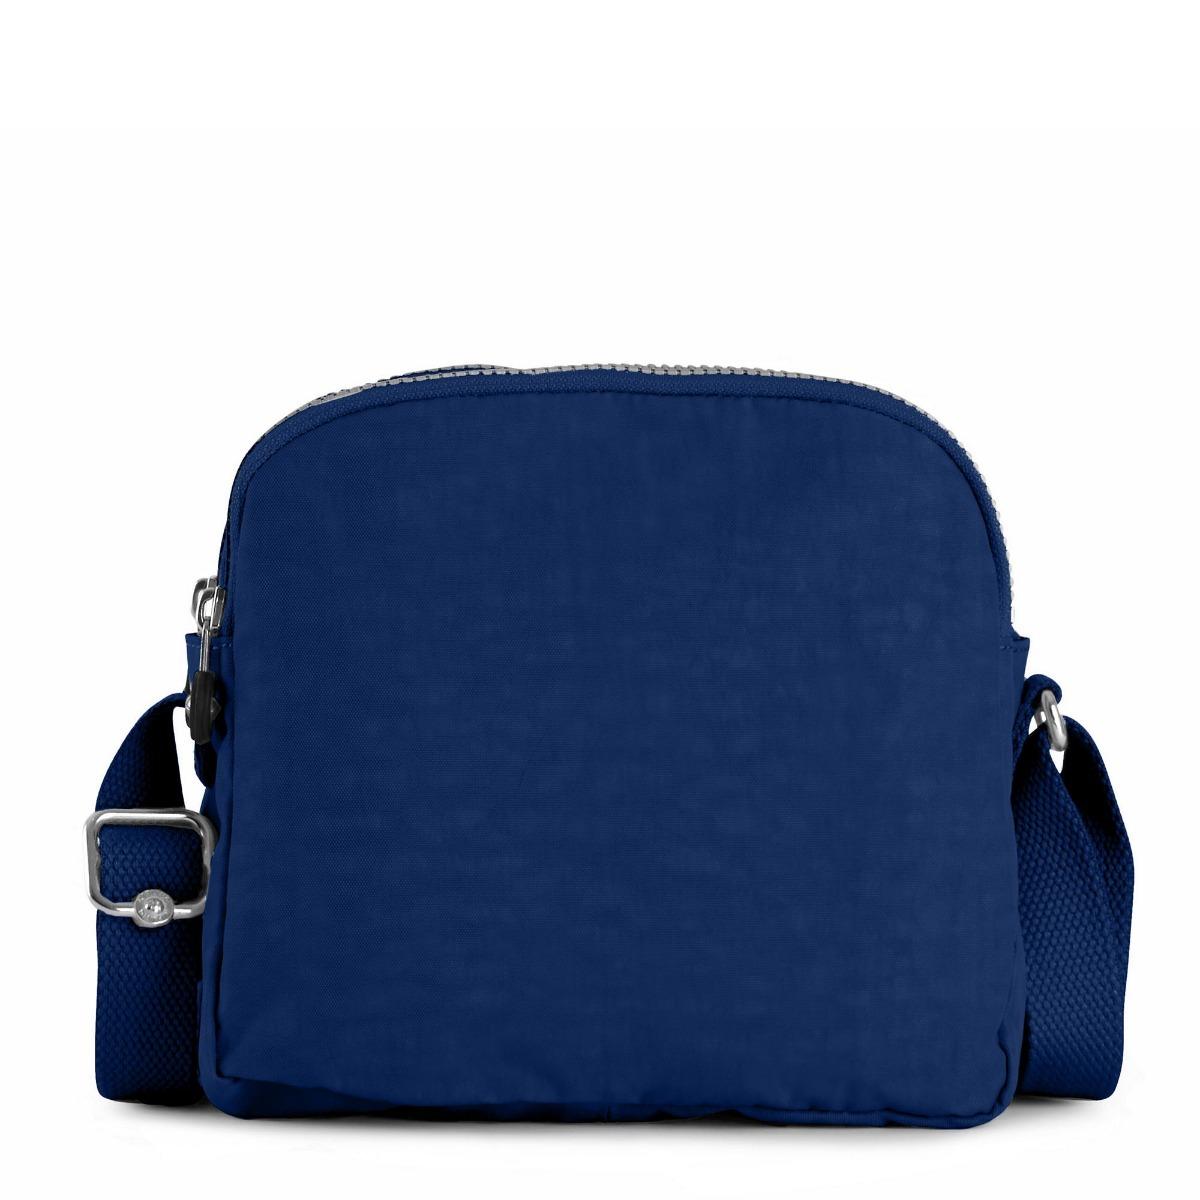 6d8857d4a Bolsa Feminina Kipling Azul Marinho - Original - R$ 299,90 em ...